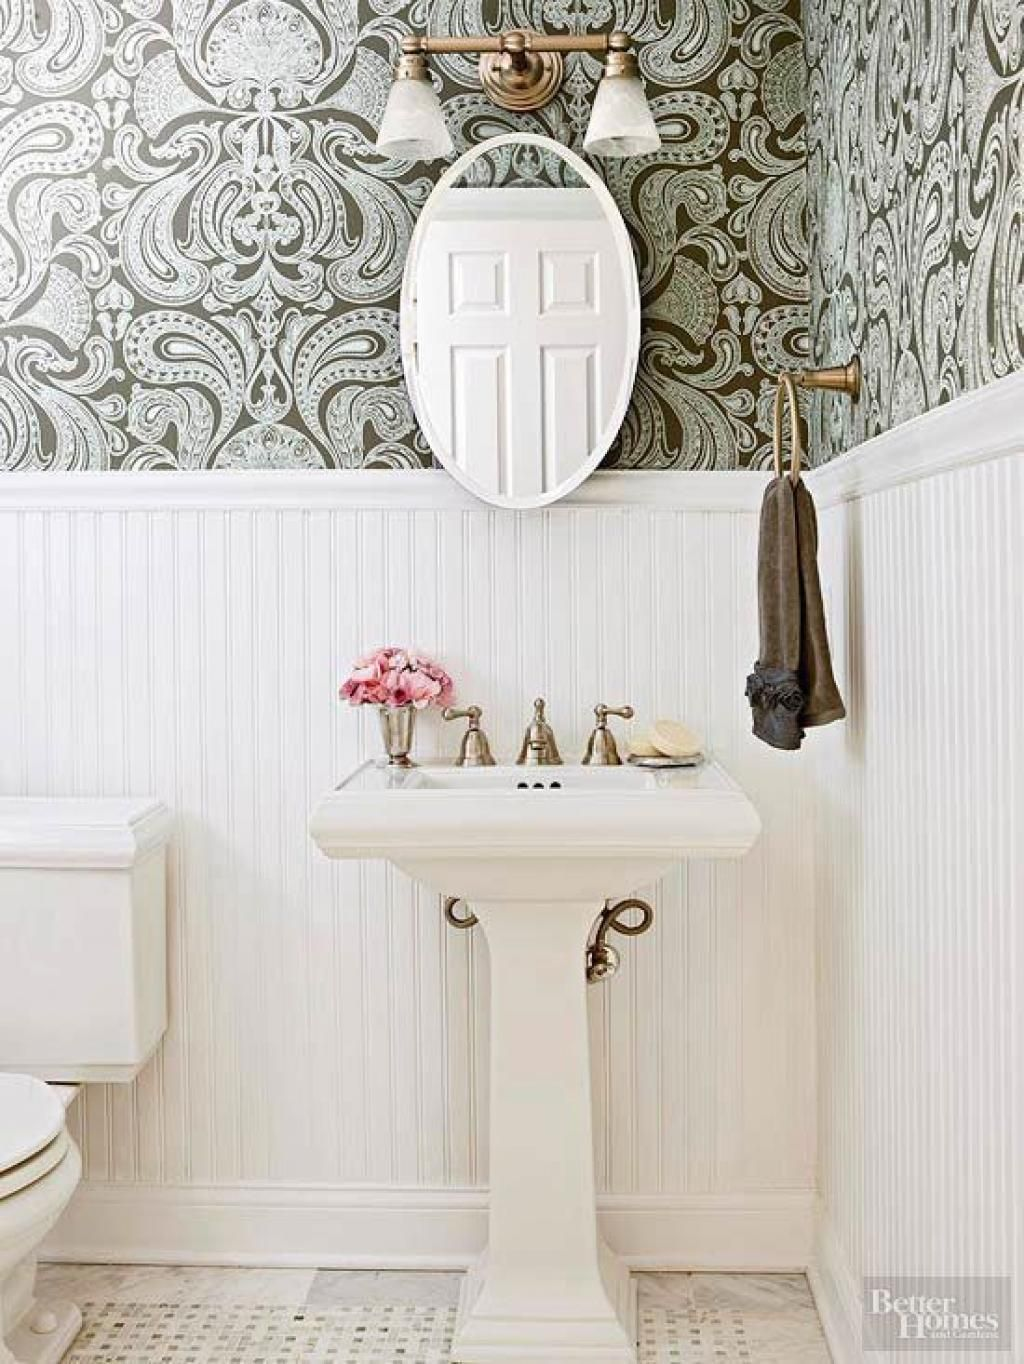 40 Stylish Bathroom Wallpaper Ideas Inspirations | Bathroom ...